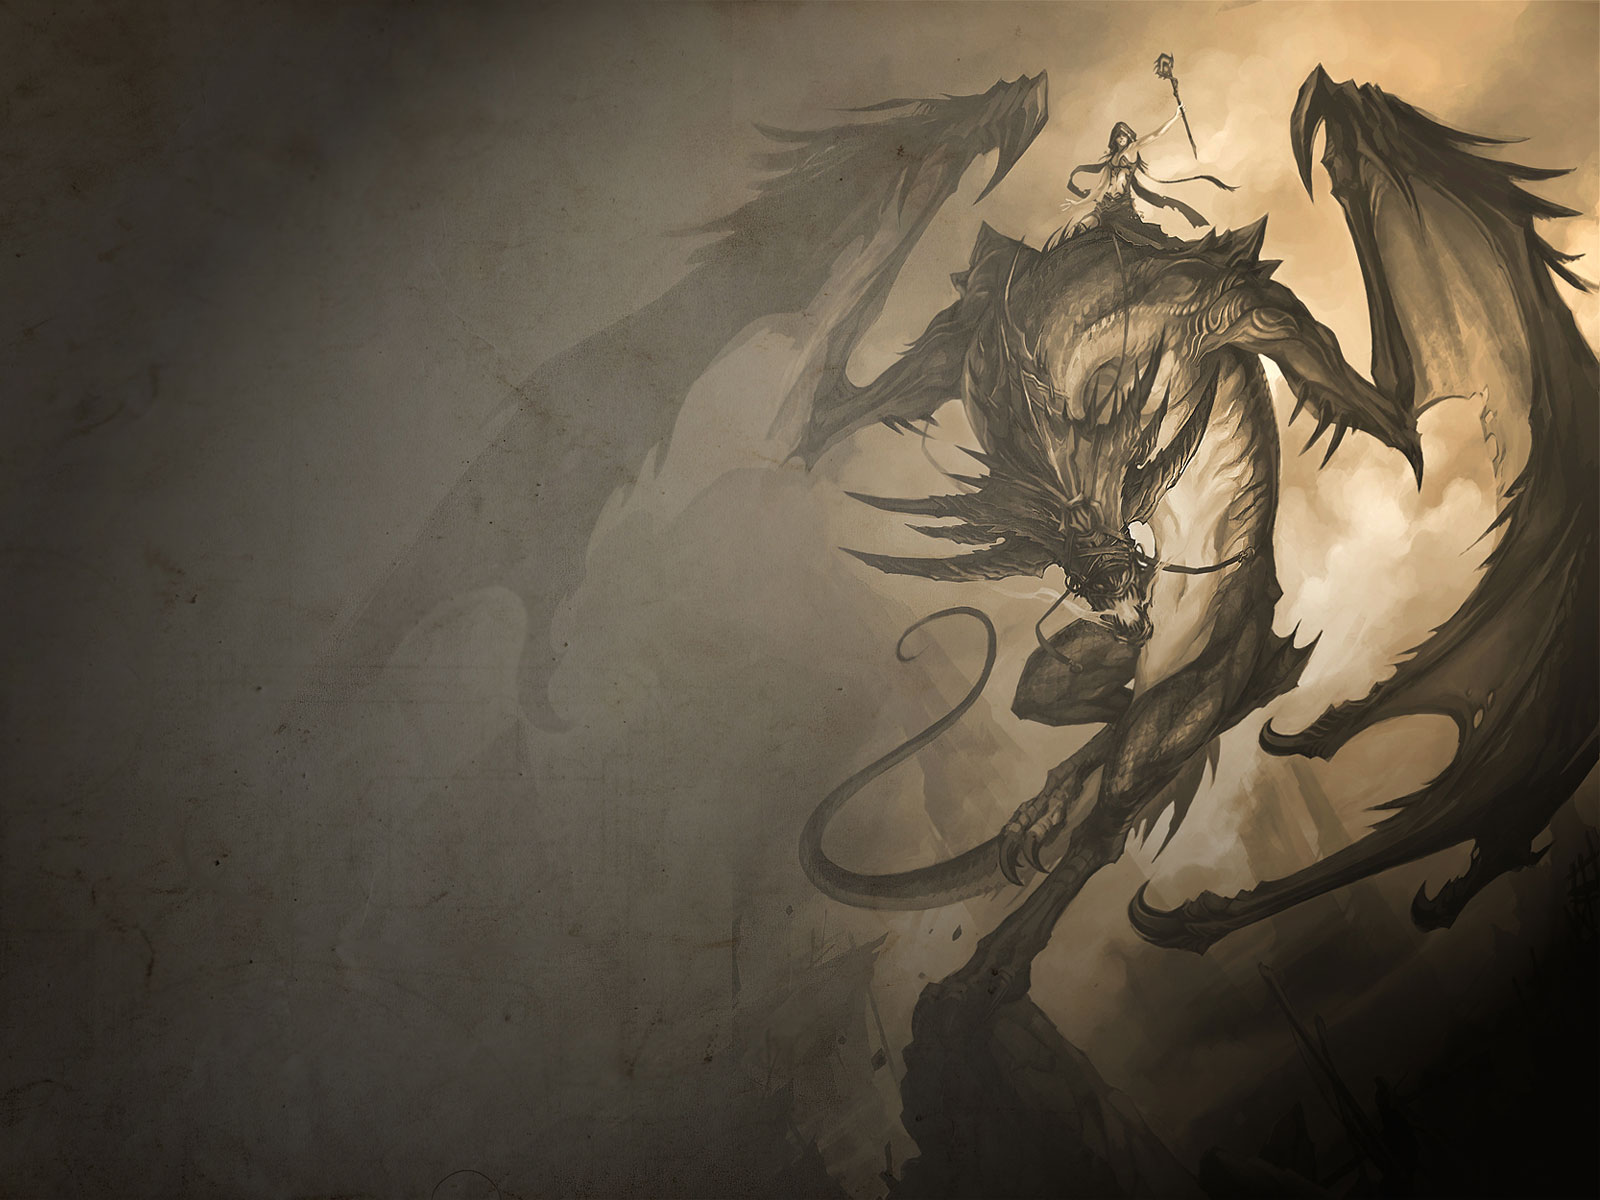 Killzone Shadow Fall Iphone 5 Wallpaper Wallpapers Hd 5 Wallpapers De Dragones Y Jinetes Fondos